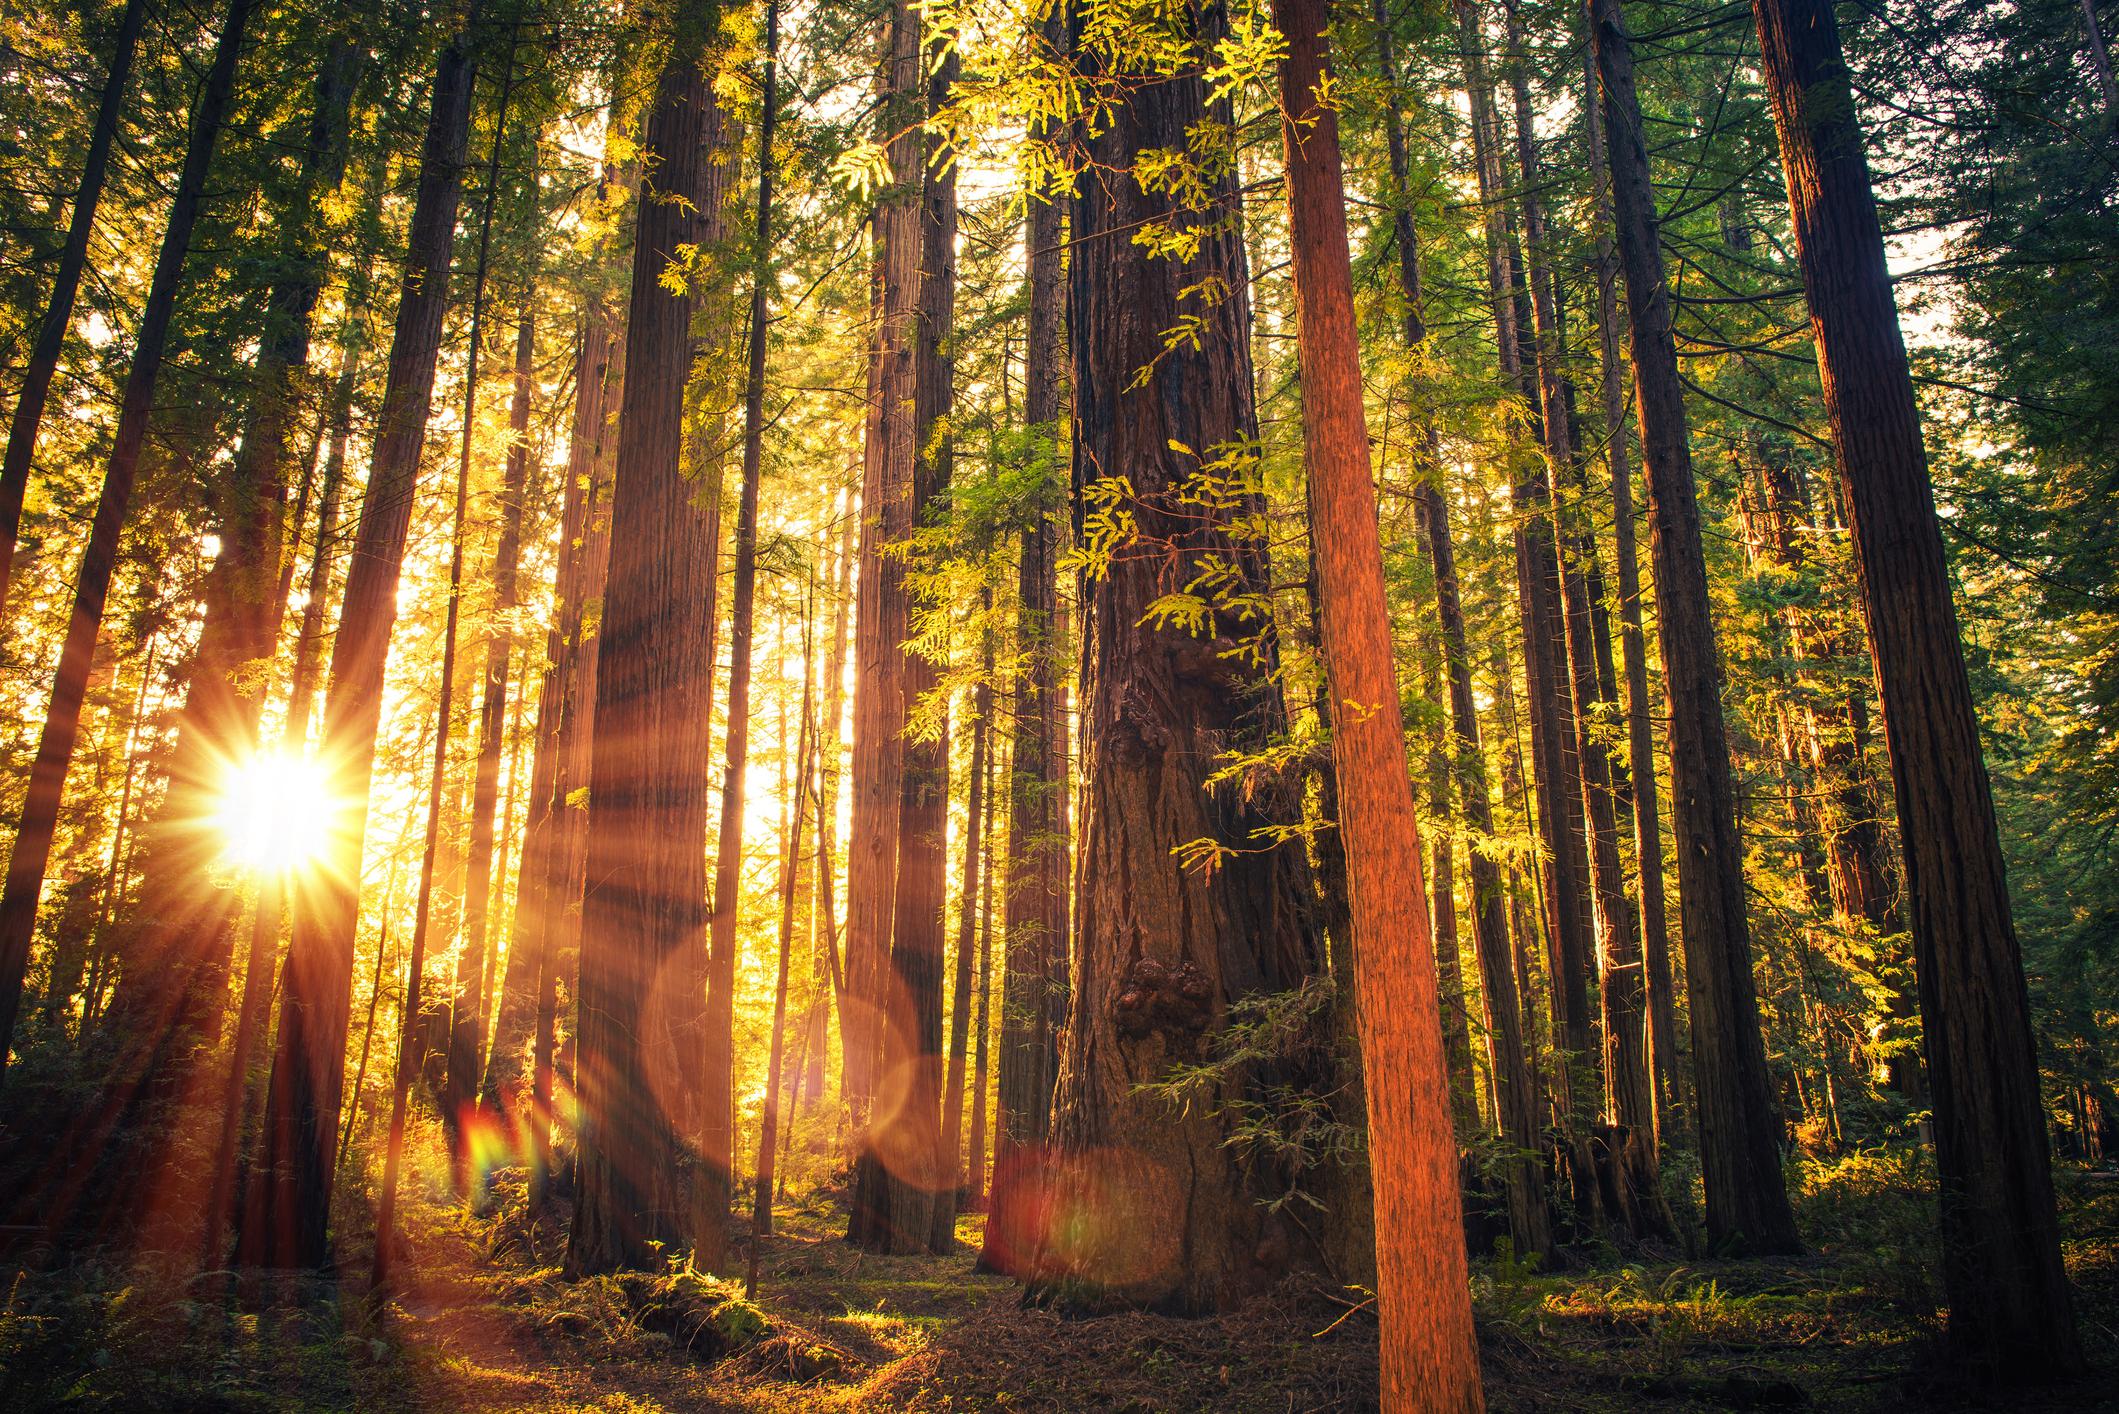 Sunlight streams through a dense forest.